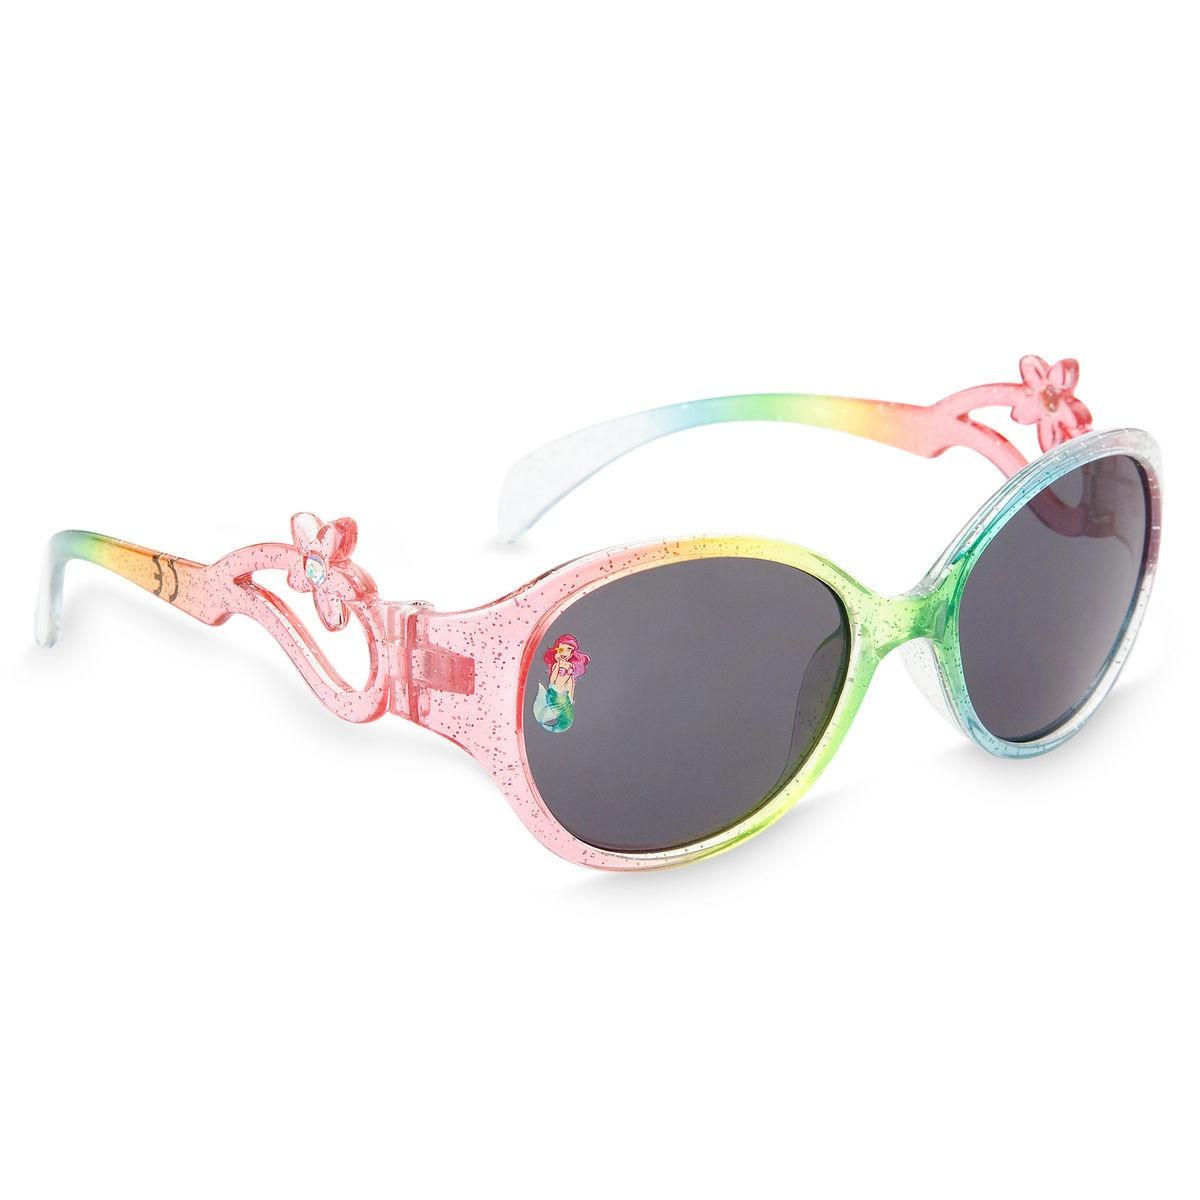 2bc3d778db79e Oculos Sol Infantil Original Disney Store Ariel Uva uvb - R  59,00 em  Mercado Livre